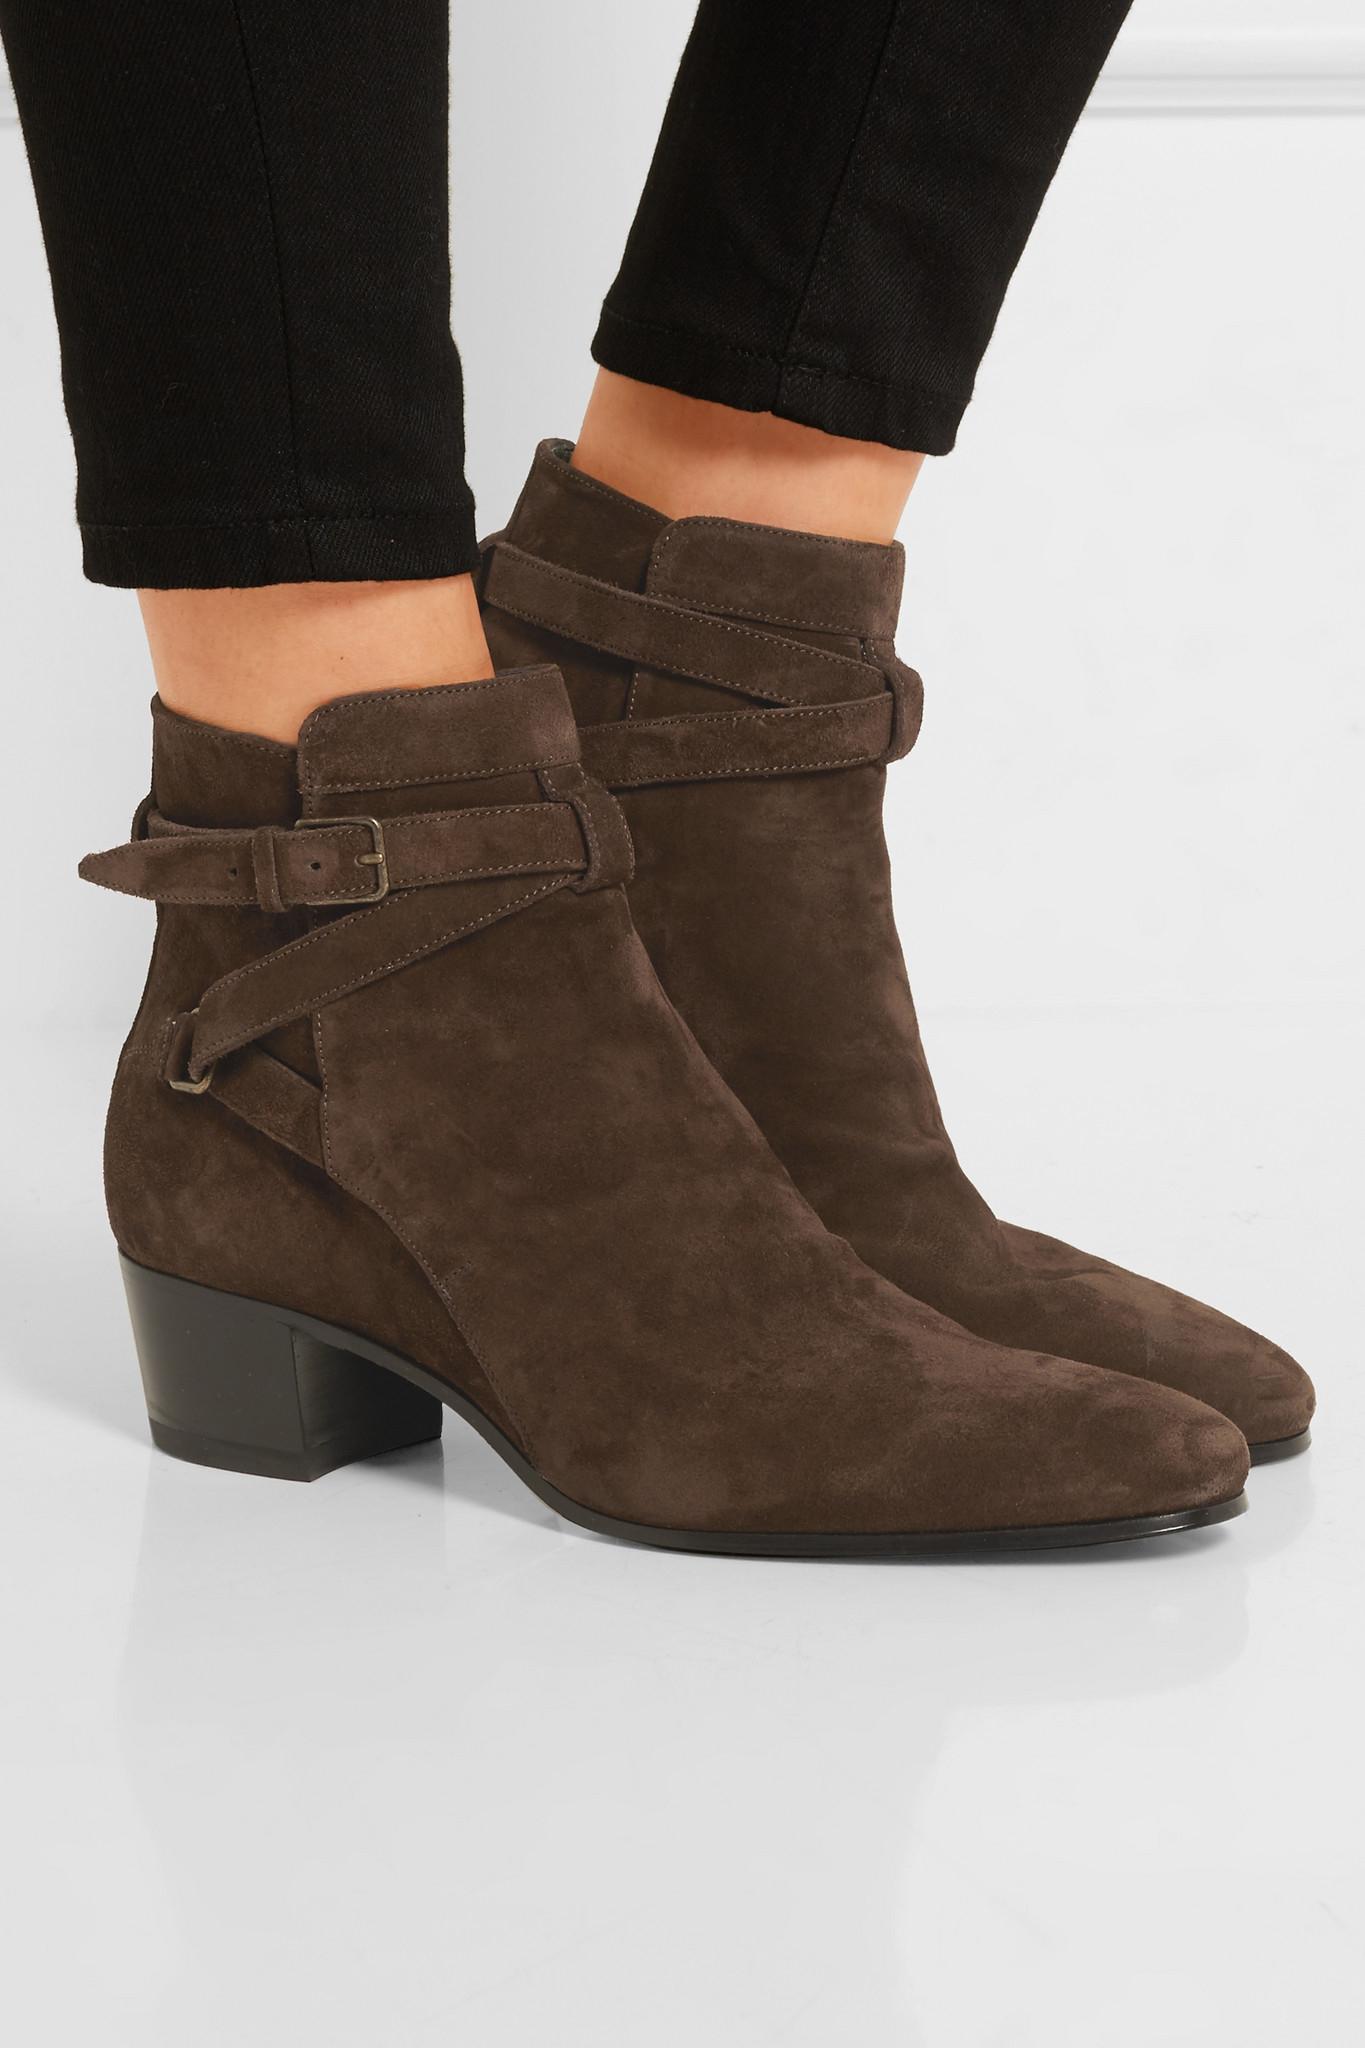 clearance shopping online great deals online Saint Laurent Suede Ankle-Strap Booties 24xlJC